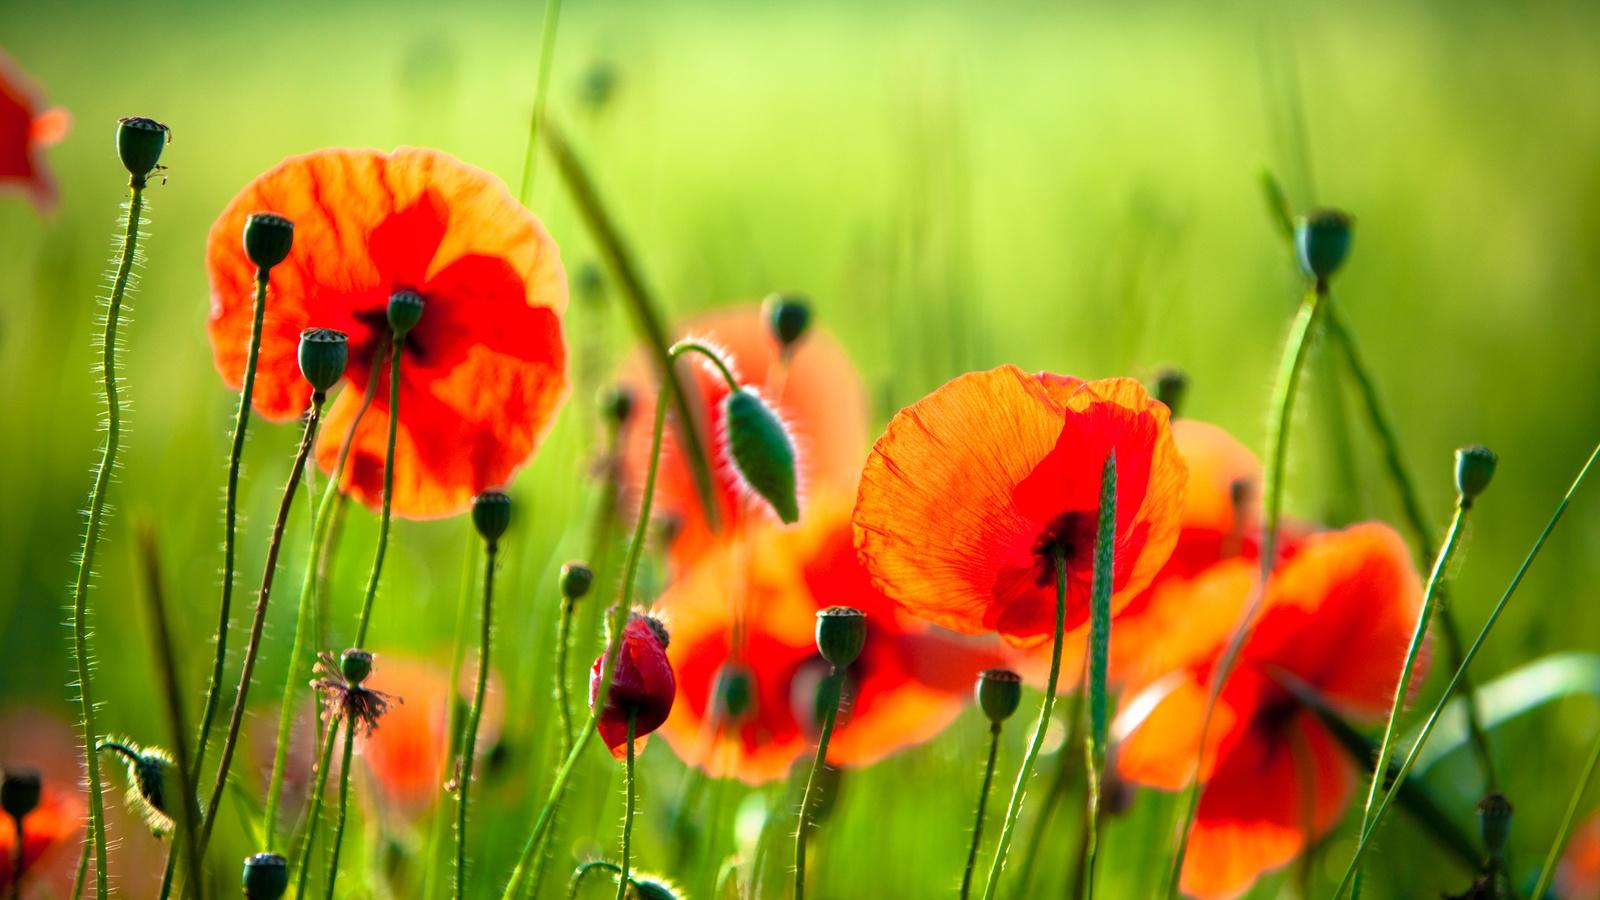 Цветы маки разрешение картинки 1600x900